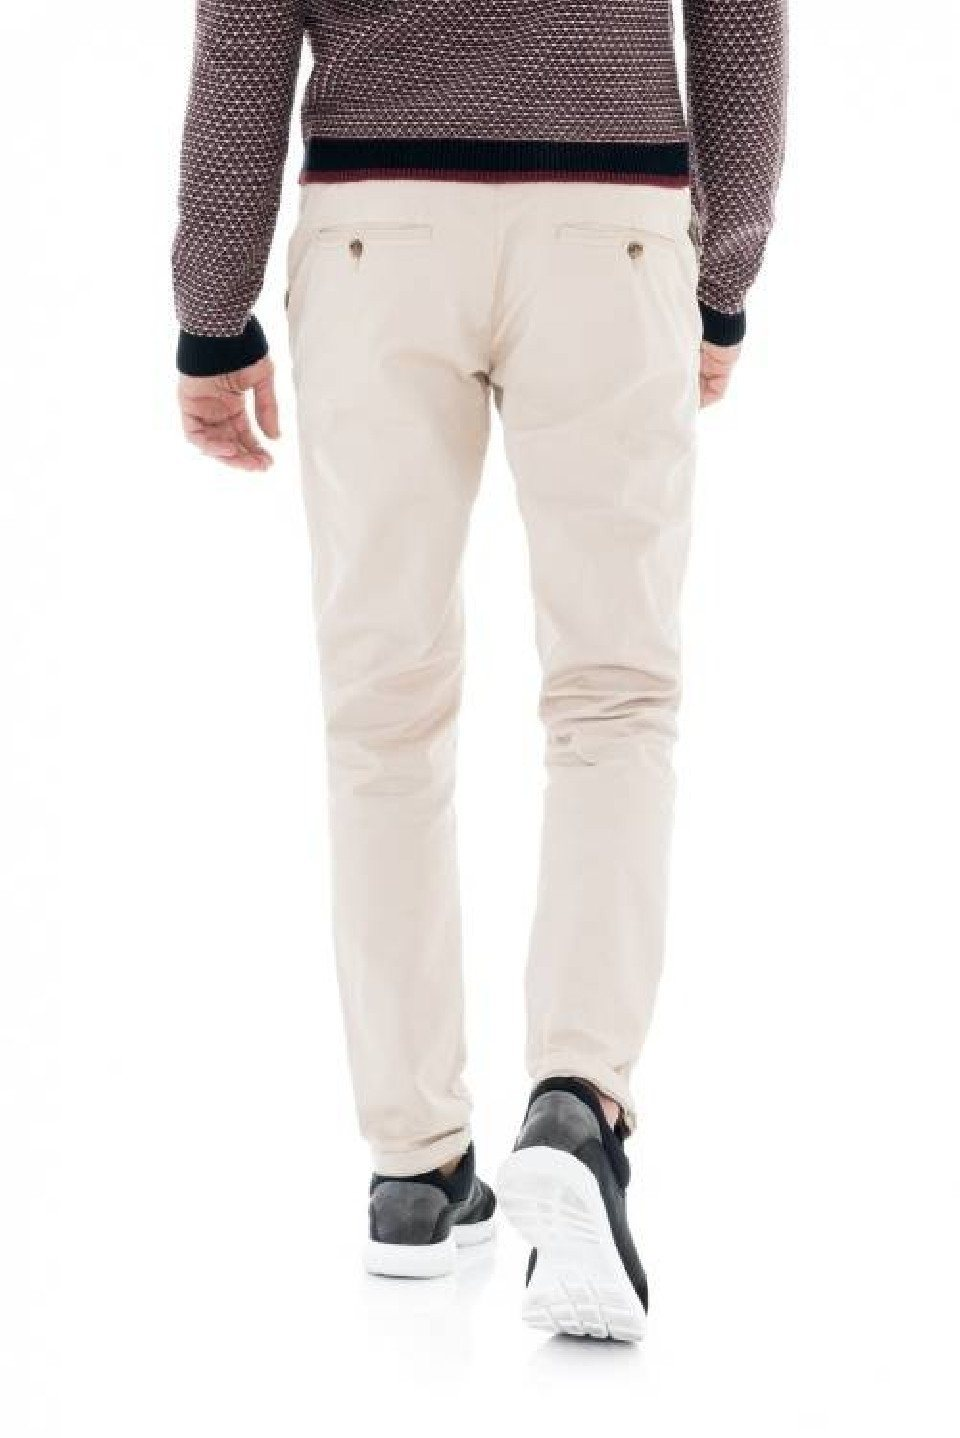 Herren salsa jeans Hose lang ANDY blau, grau, orange, schwarz, weiß | 05604562777094